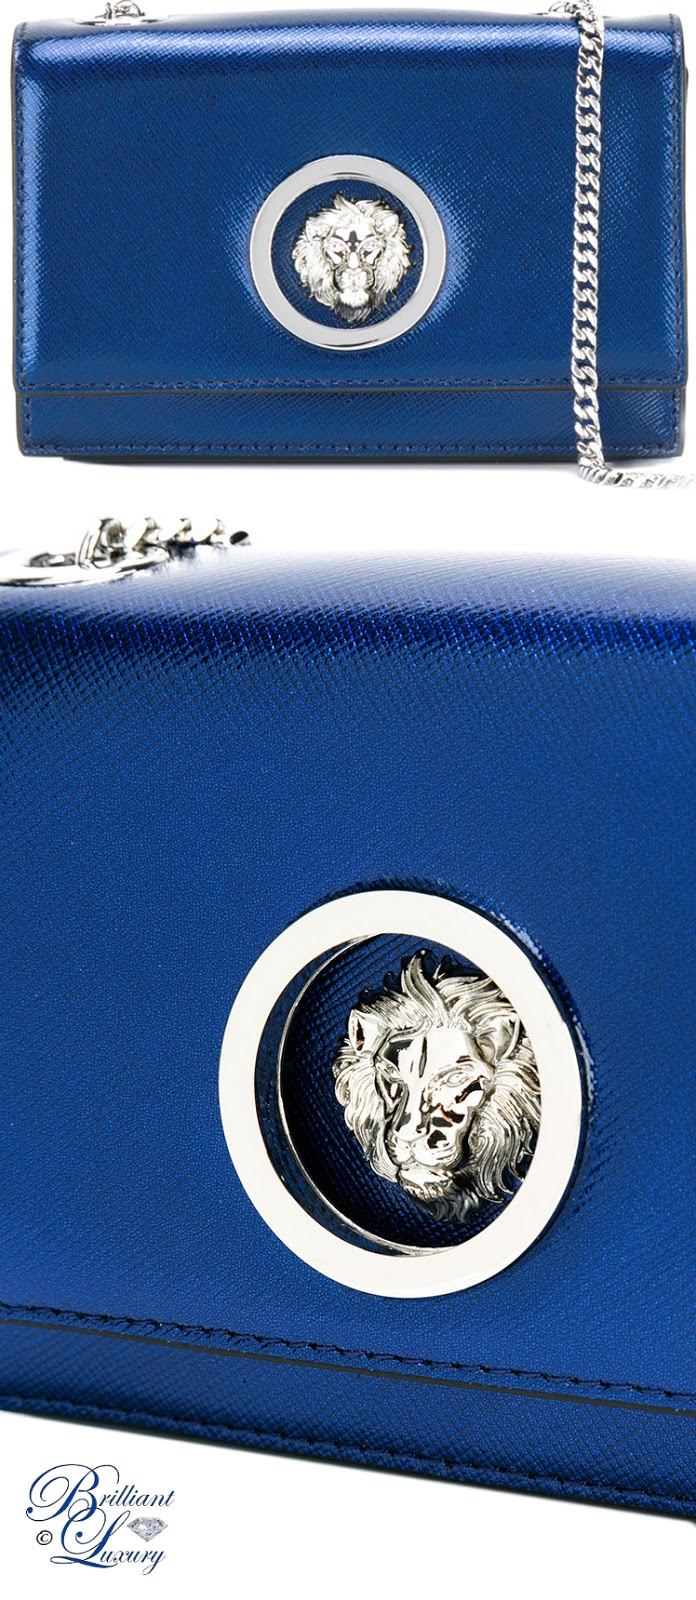 Brilliant Luxury ♦ Versus Lion Head Shoulder Bag